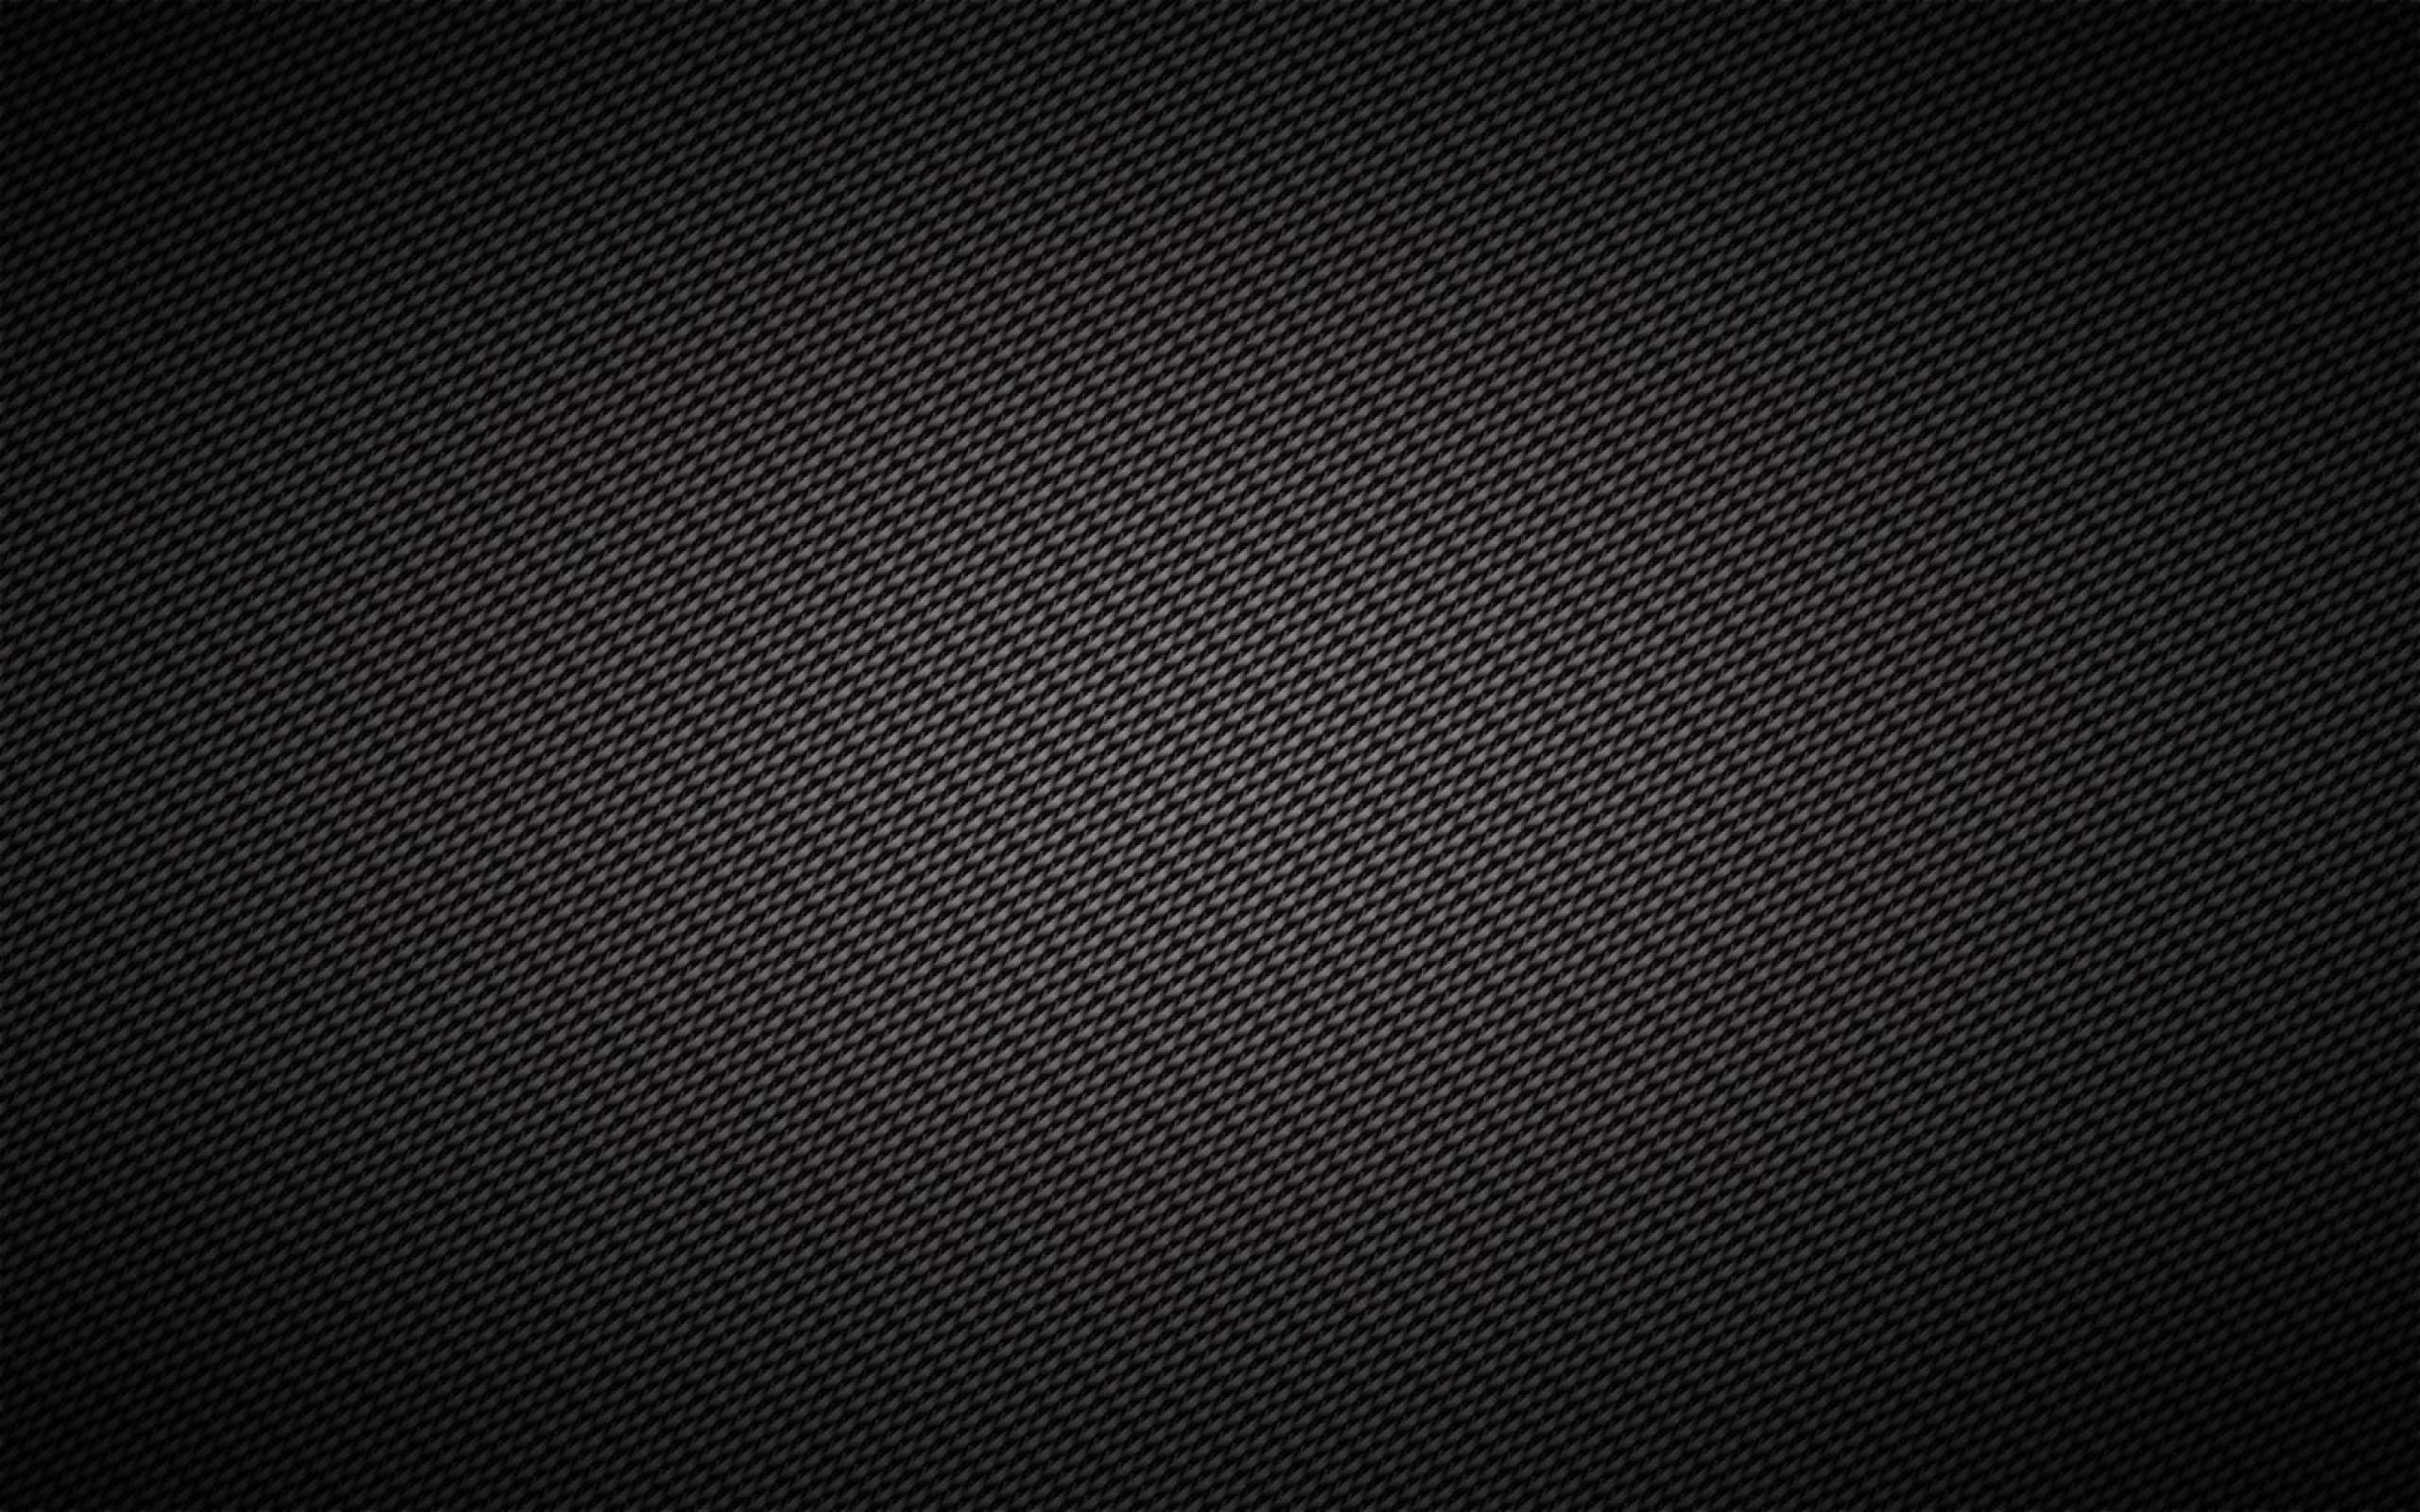 carbon background 1440x900 wallpaper Wallpaper Wallpapers 2560x1600